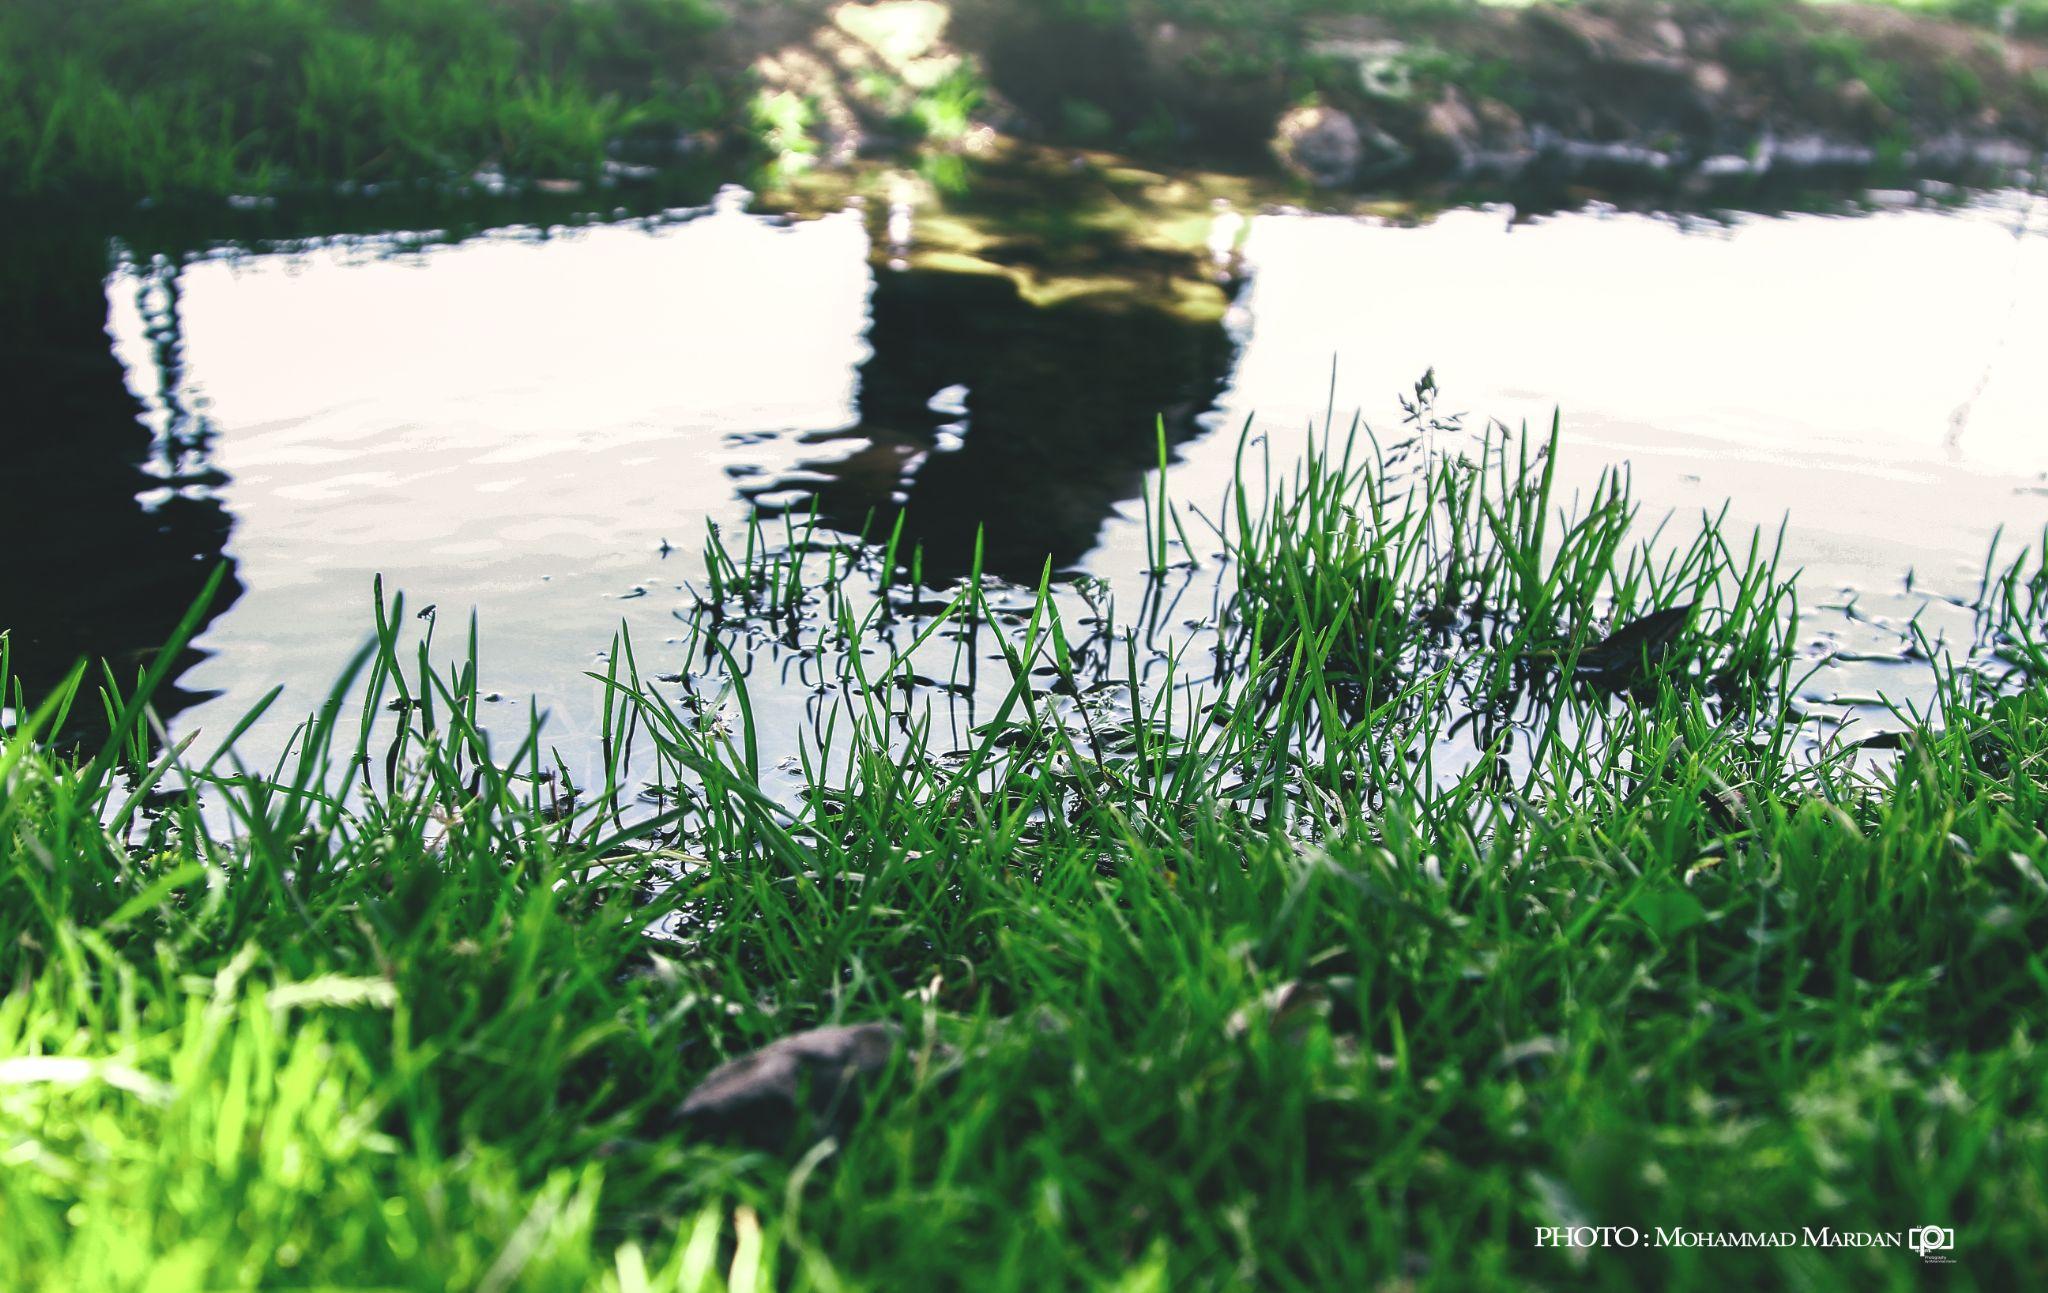 Reflection by mohammad mardan